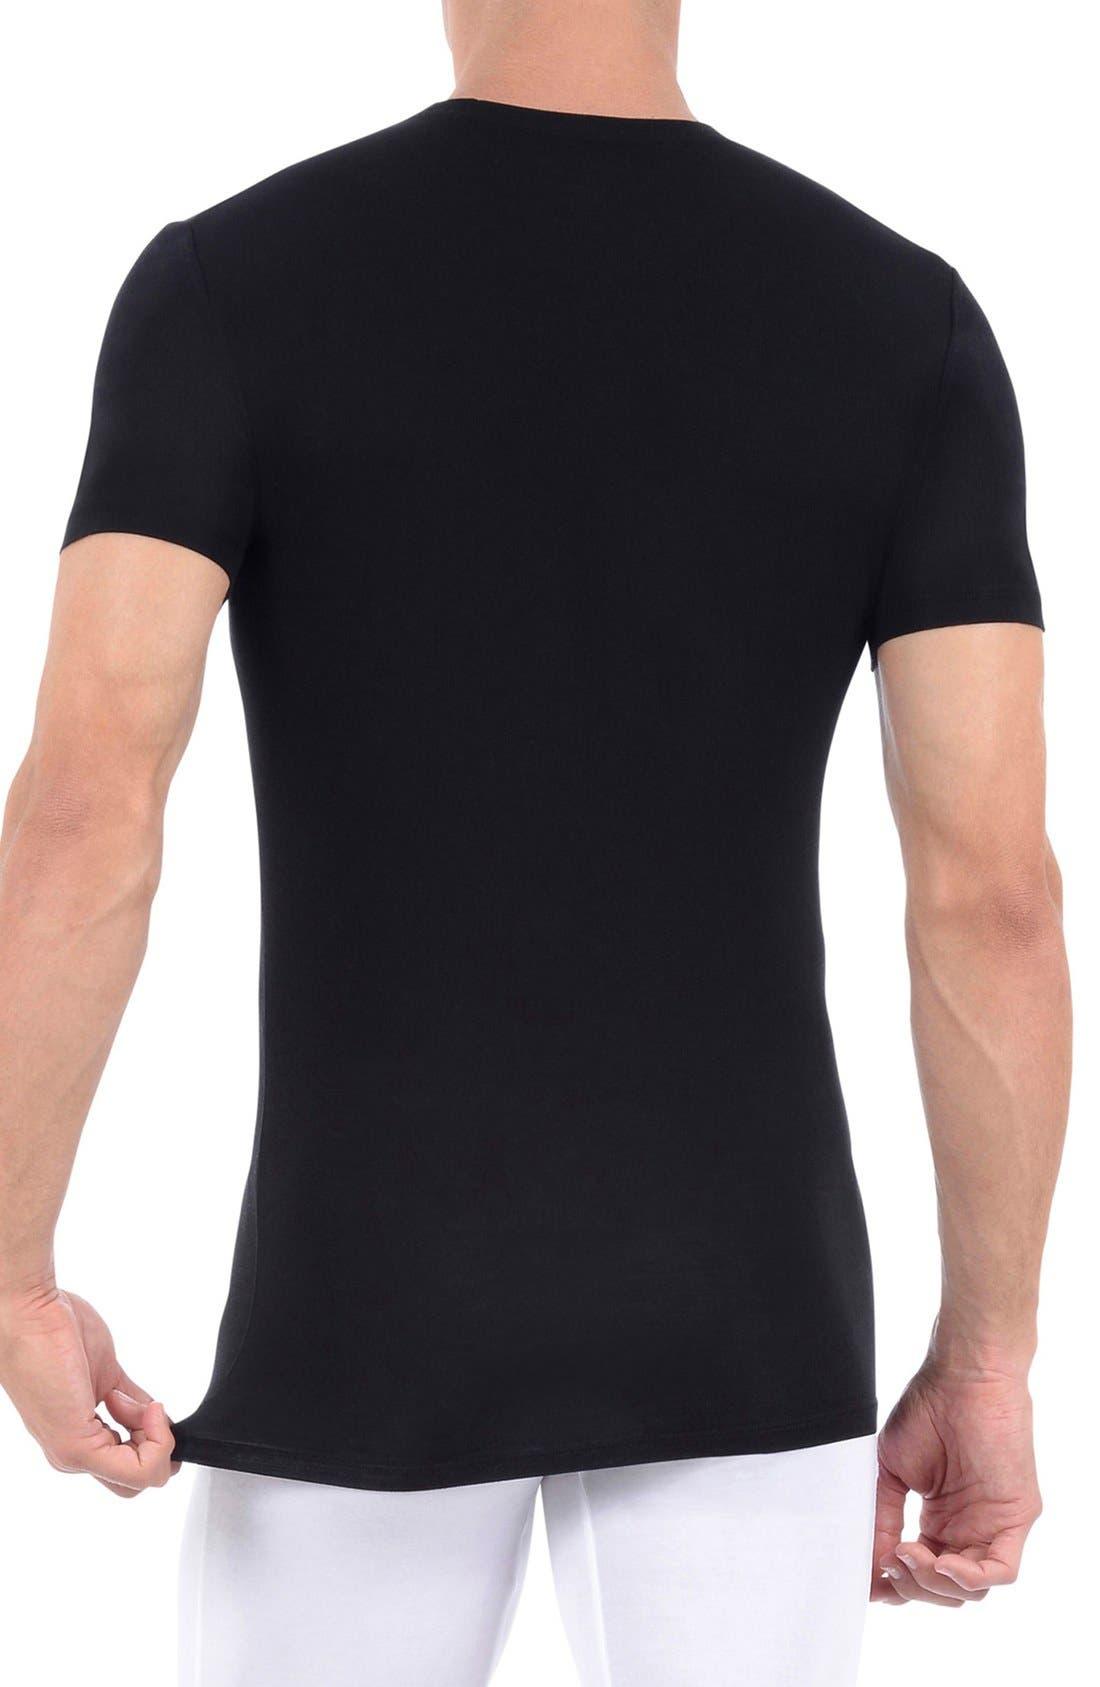 Alternate Image 2  - Tommy John 'Second Skin' Crewneck Undershirt